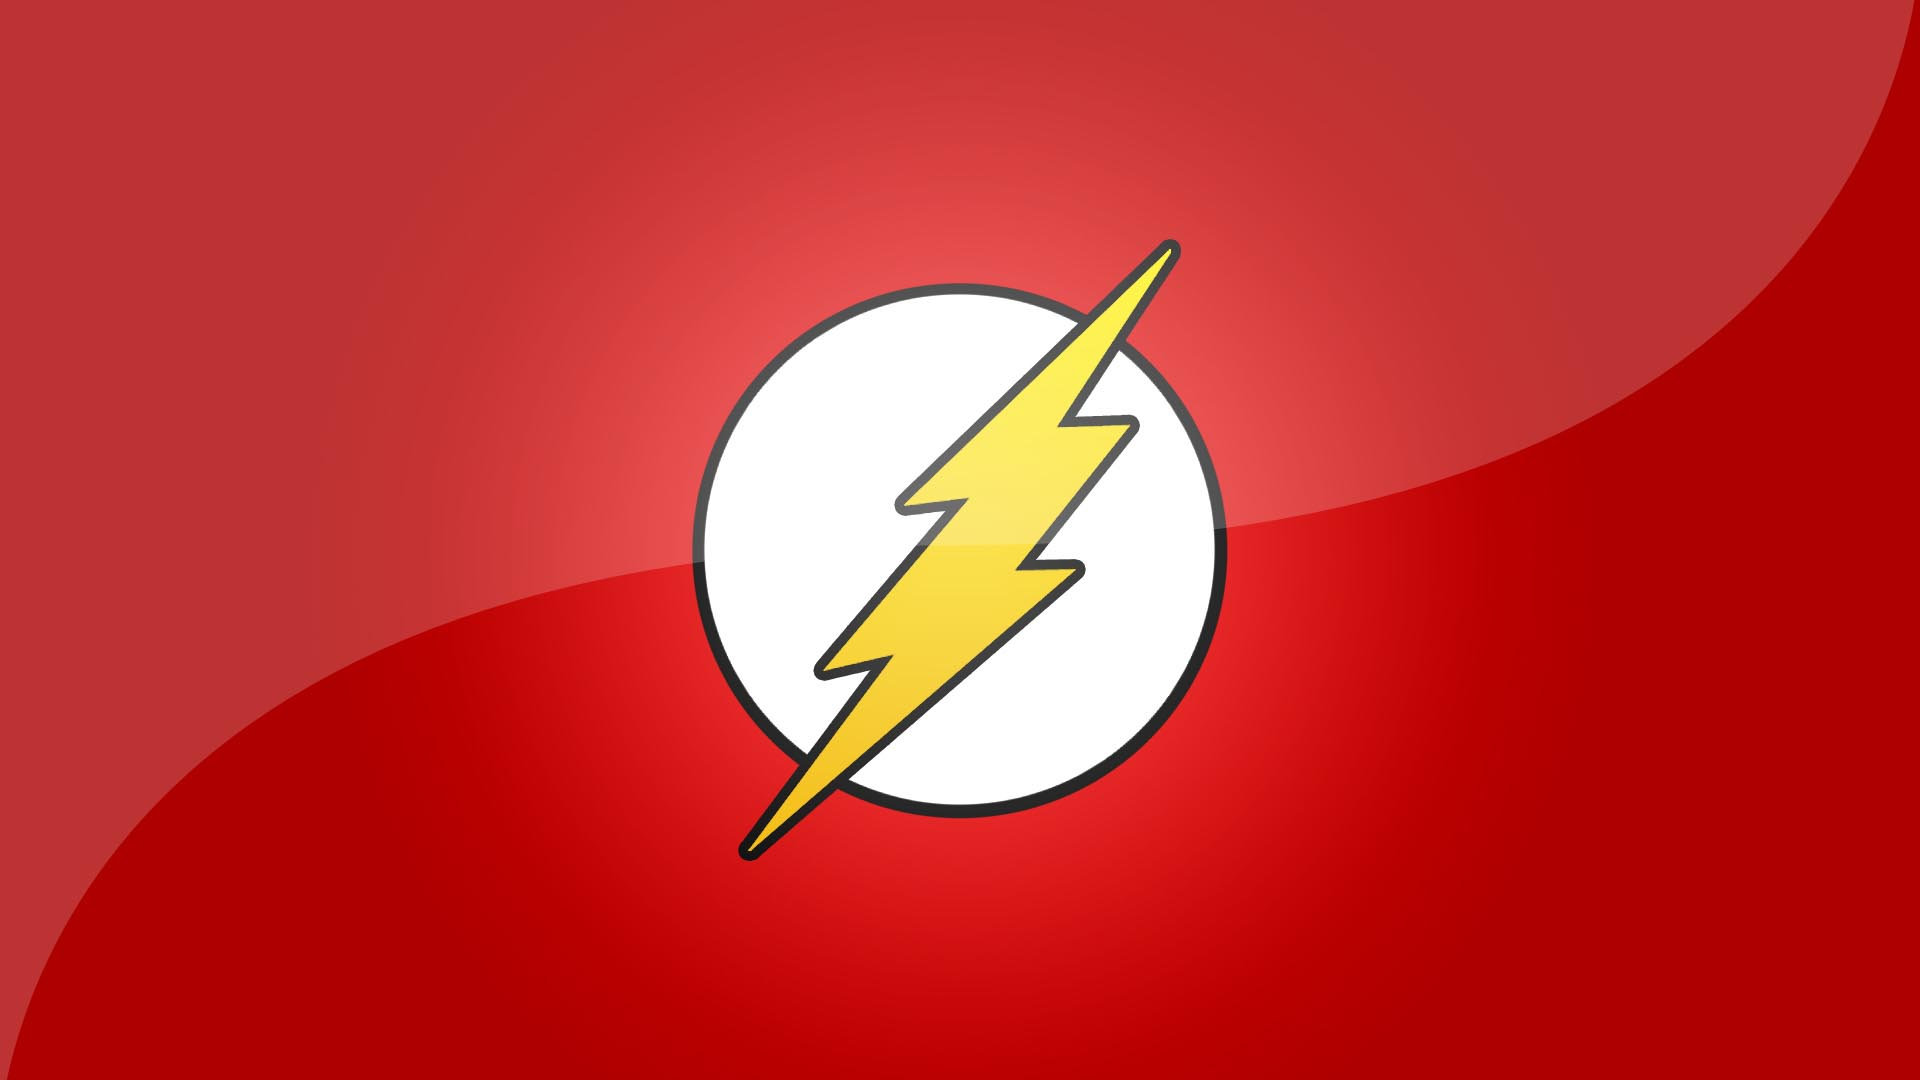 The Flash Hd Wallpaper.